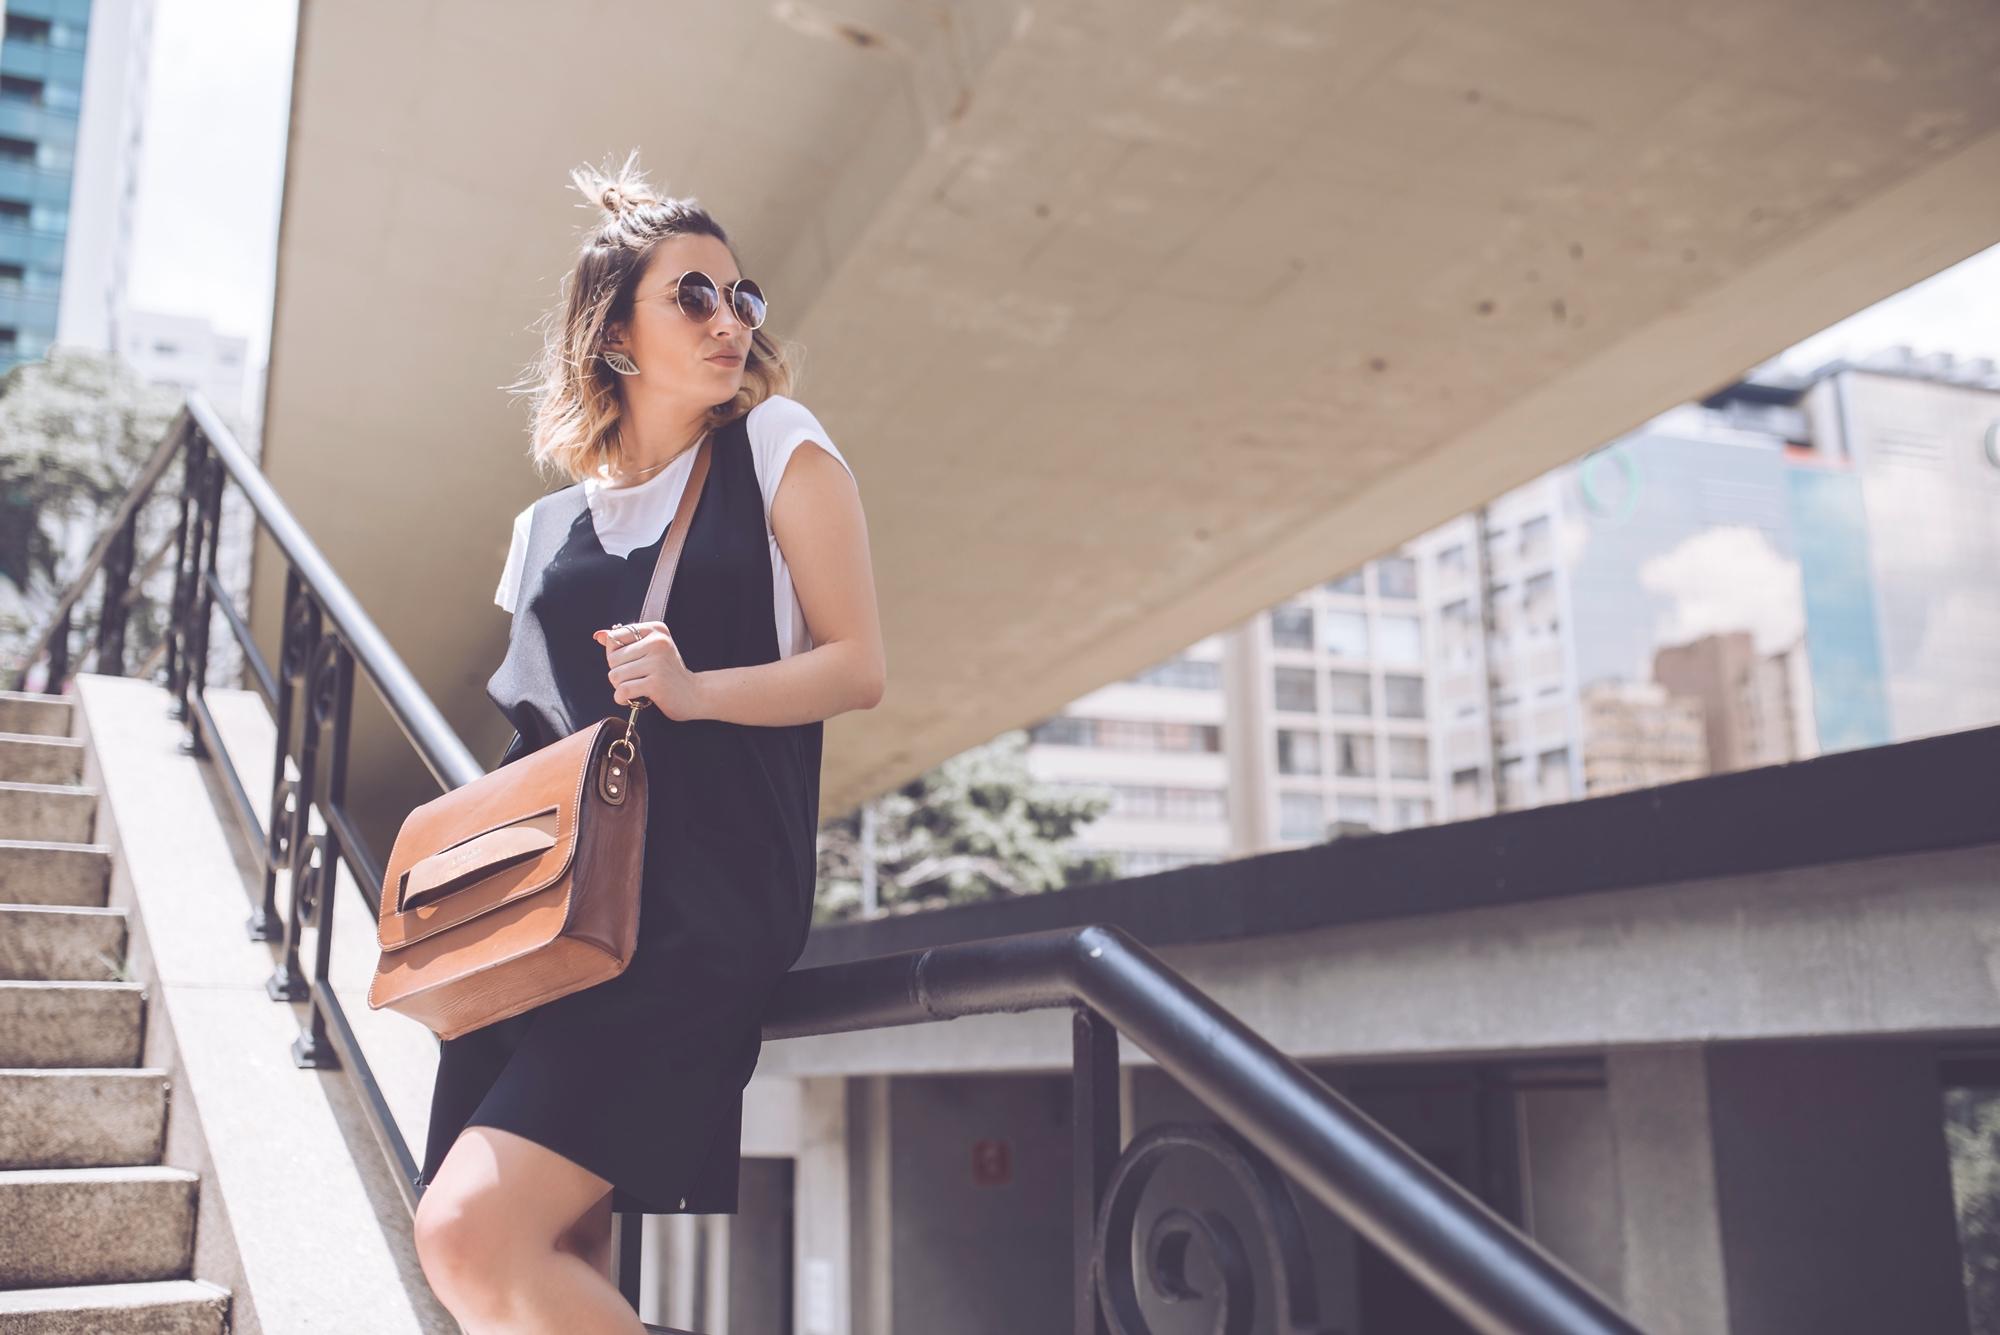 bolsas-binari-como-usar-look-casual-look-trabalho-5